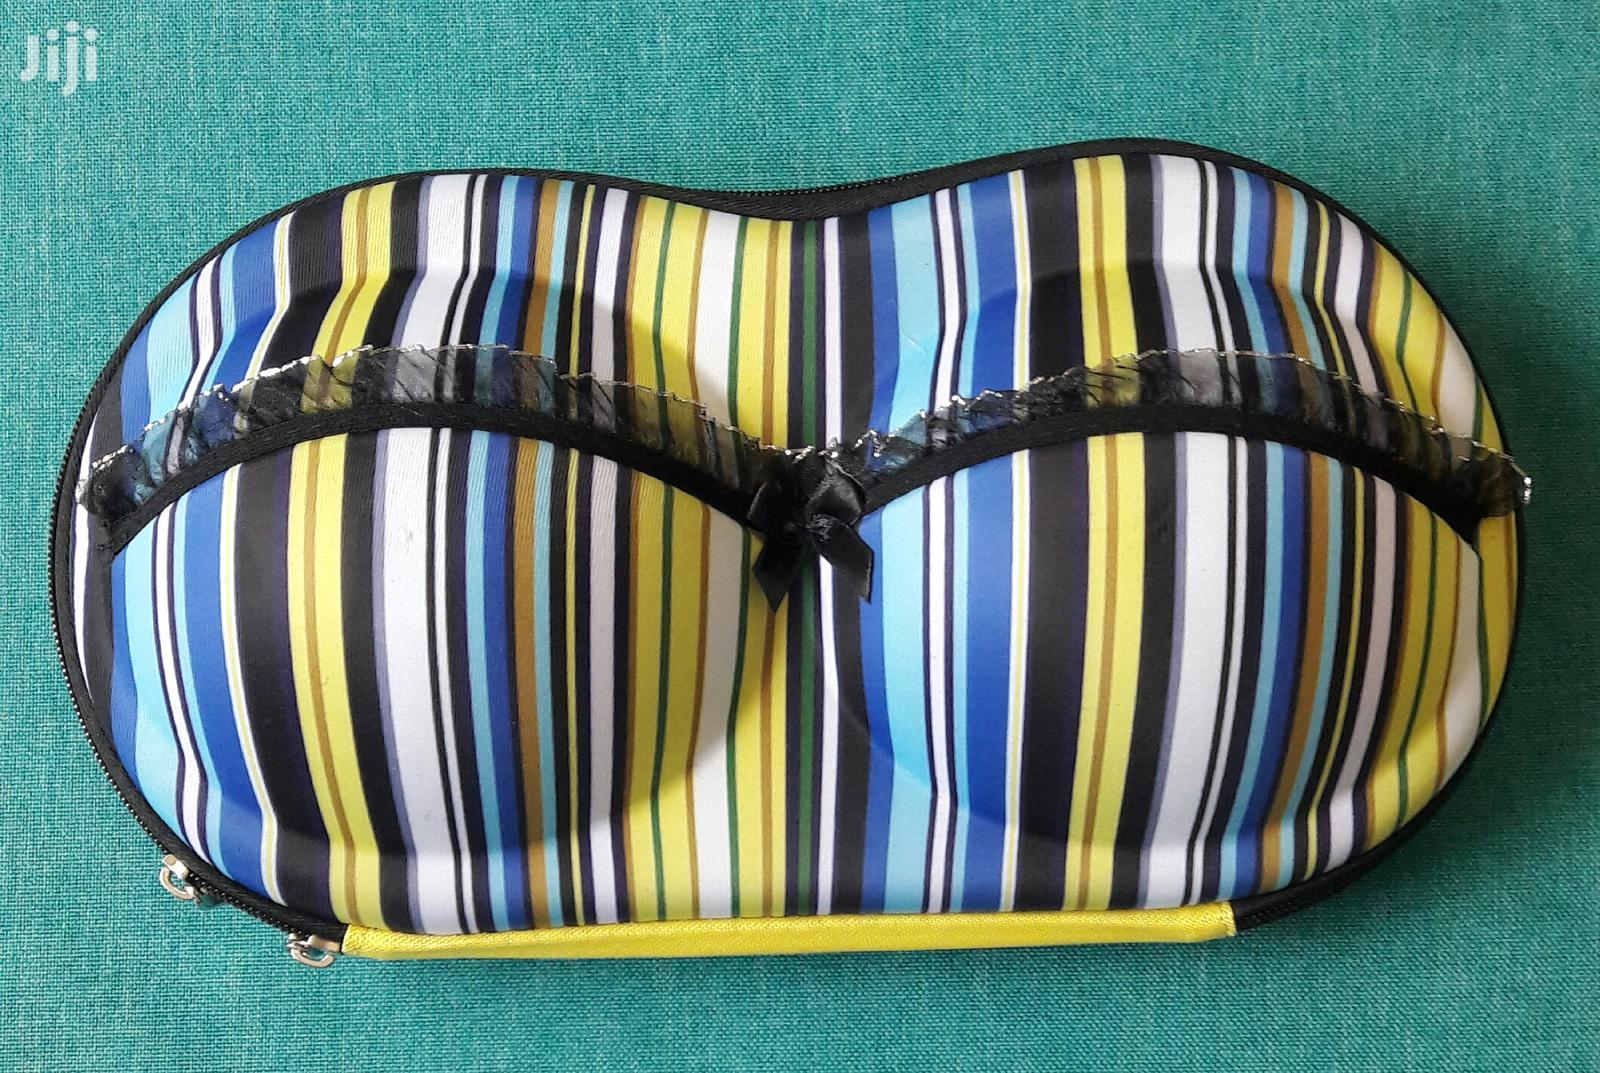 Bras & Panties Organiser | Bags for sale in Nairobi Central, Nairobi, Kenya